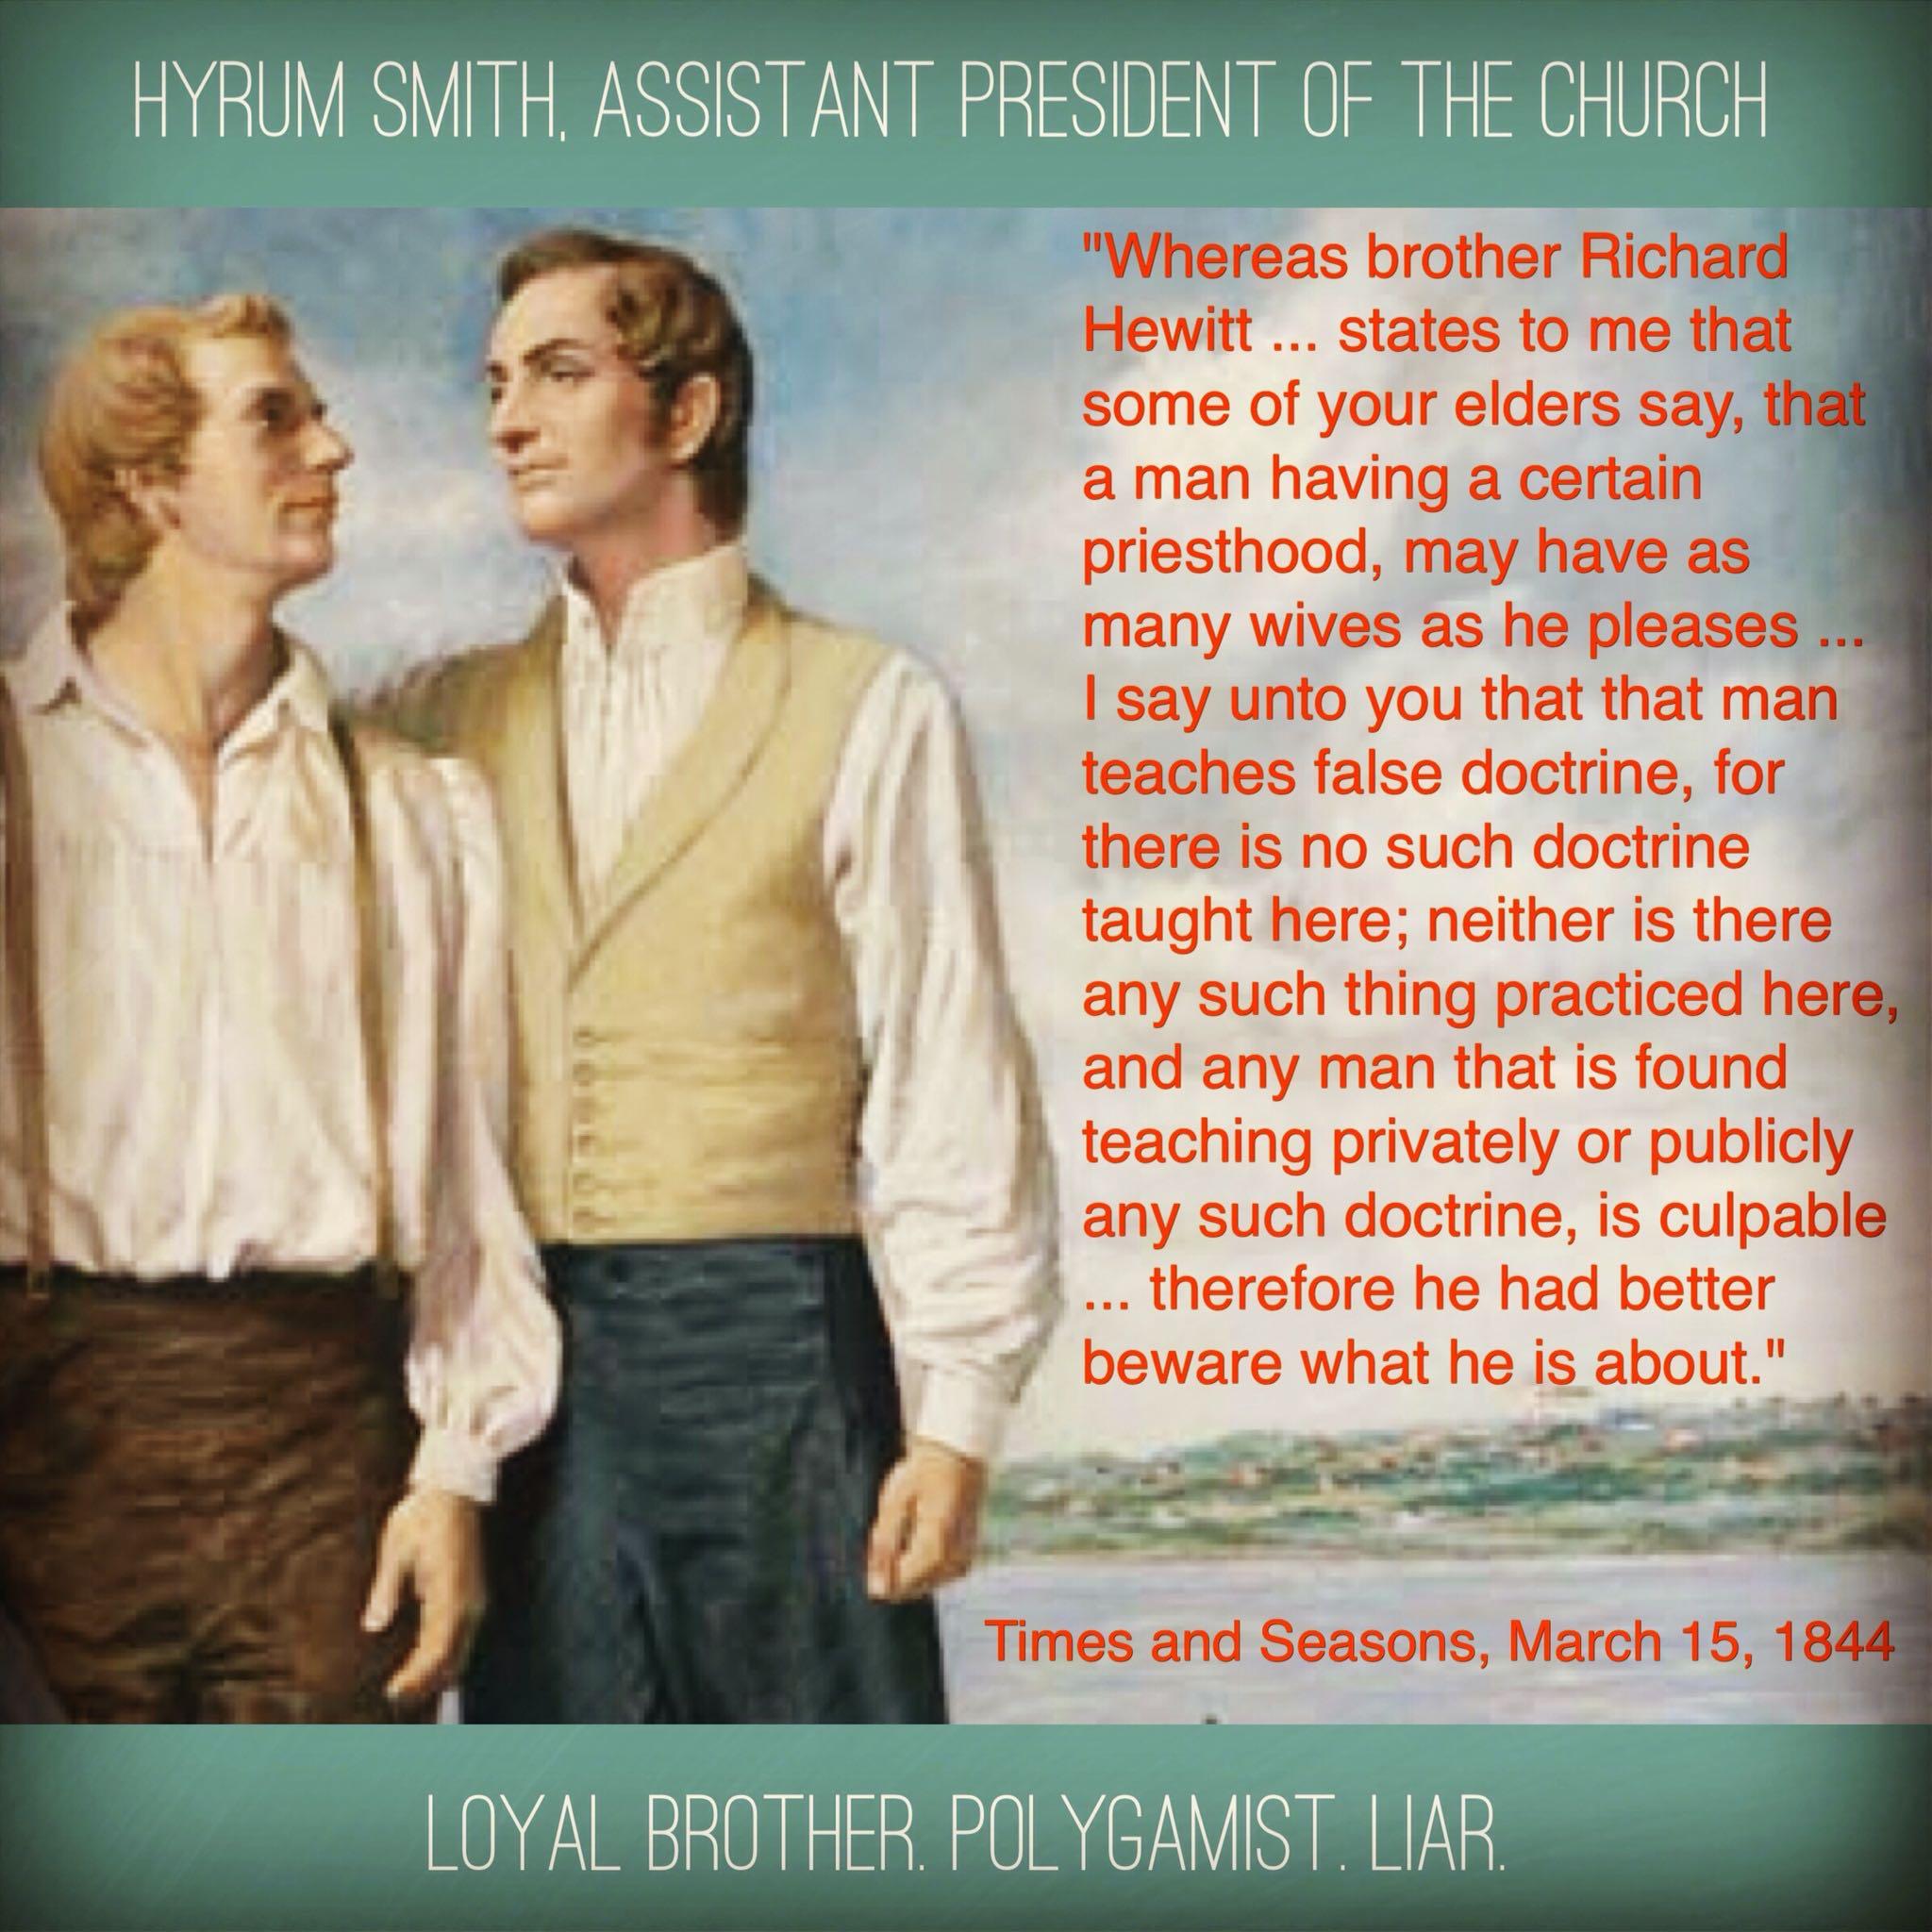 Lying Brother Hyrum